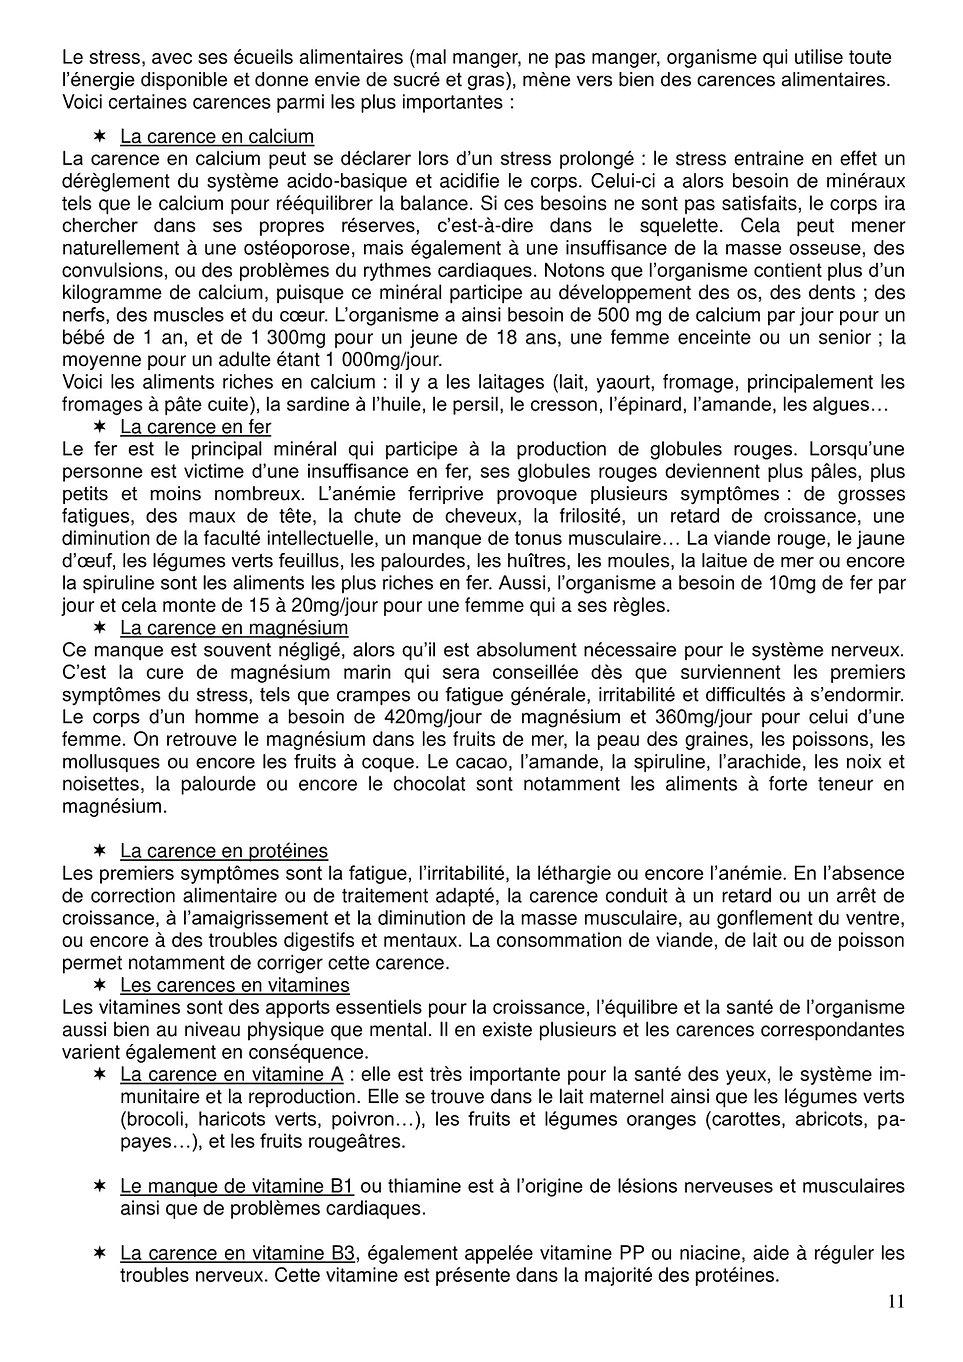 STRESS_et_ÉMOTIONS-11.jpg